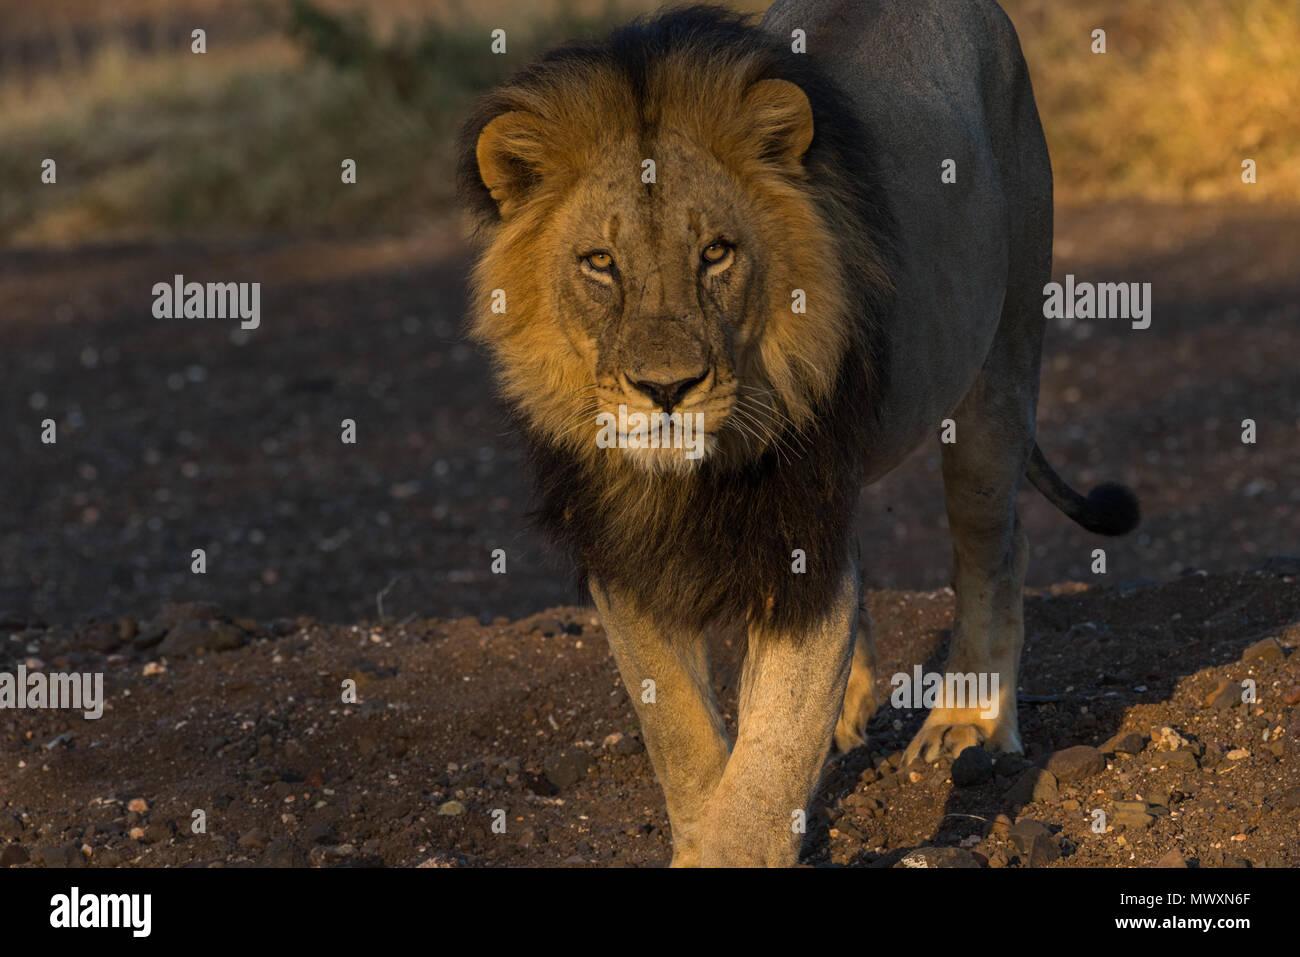 Maschio nero Maned Leone africano a Riserva di Mashatu Botswana Immagini Stock